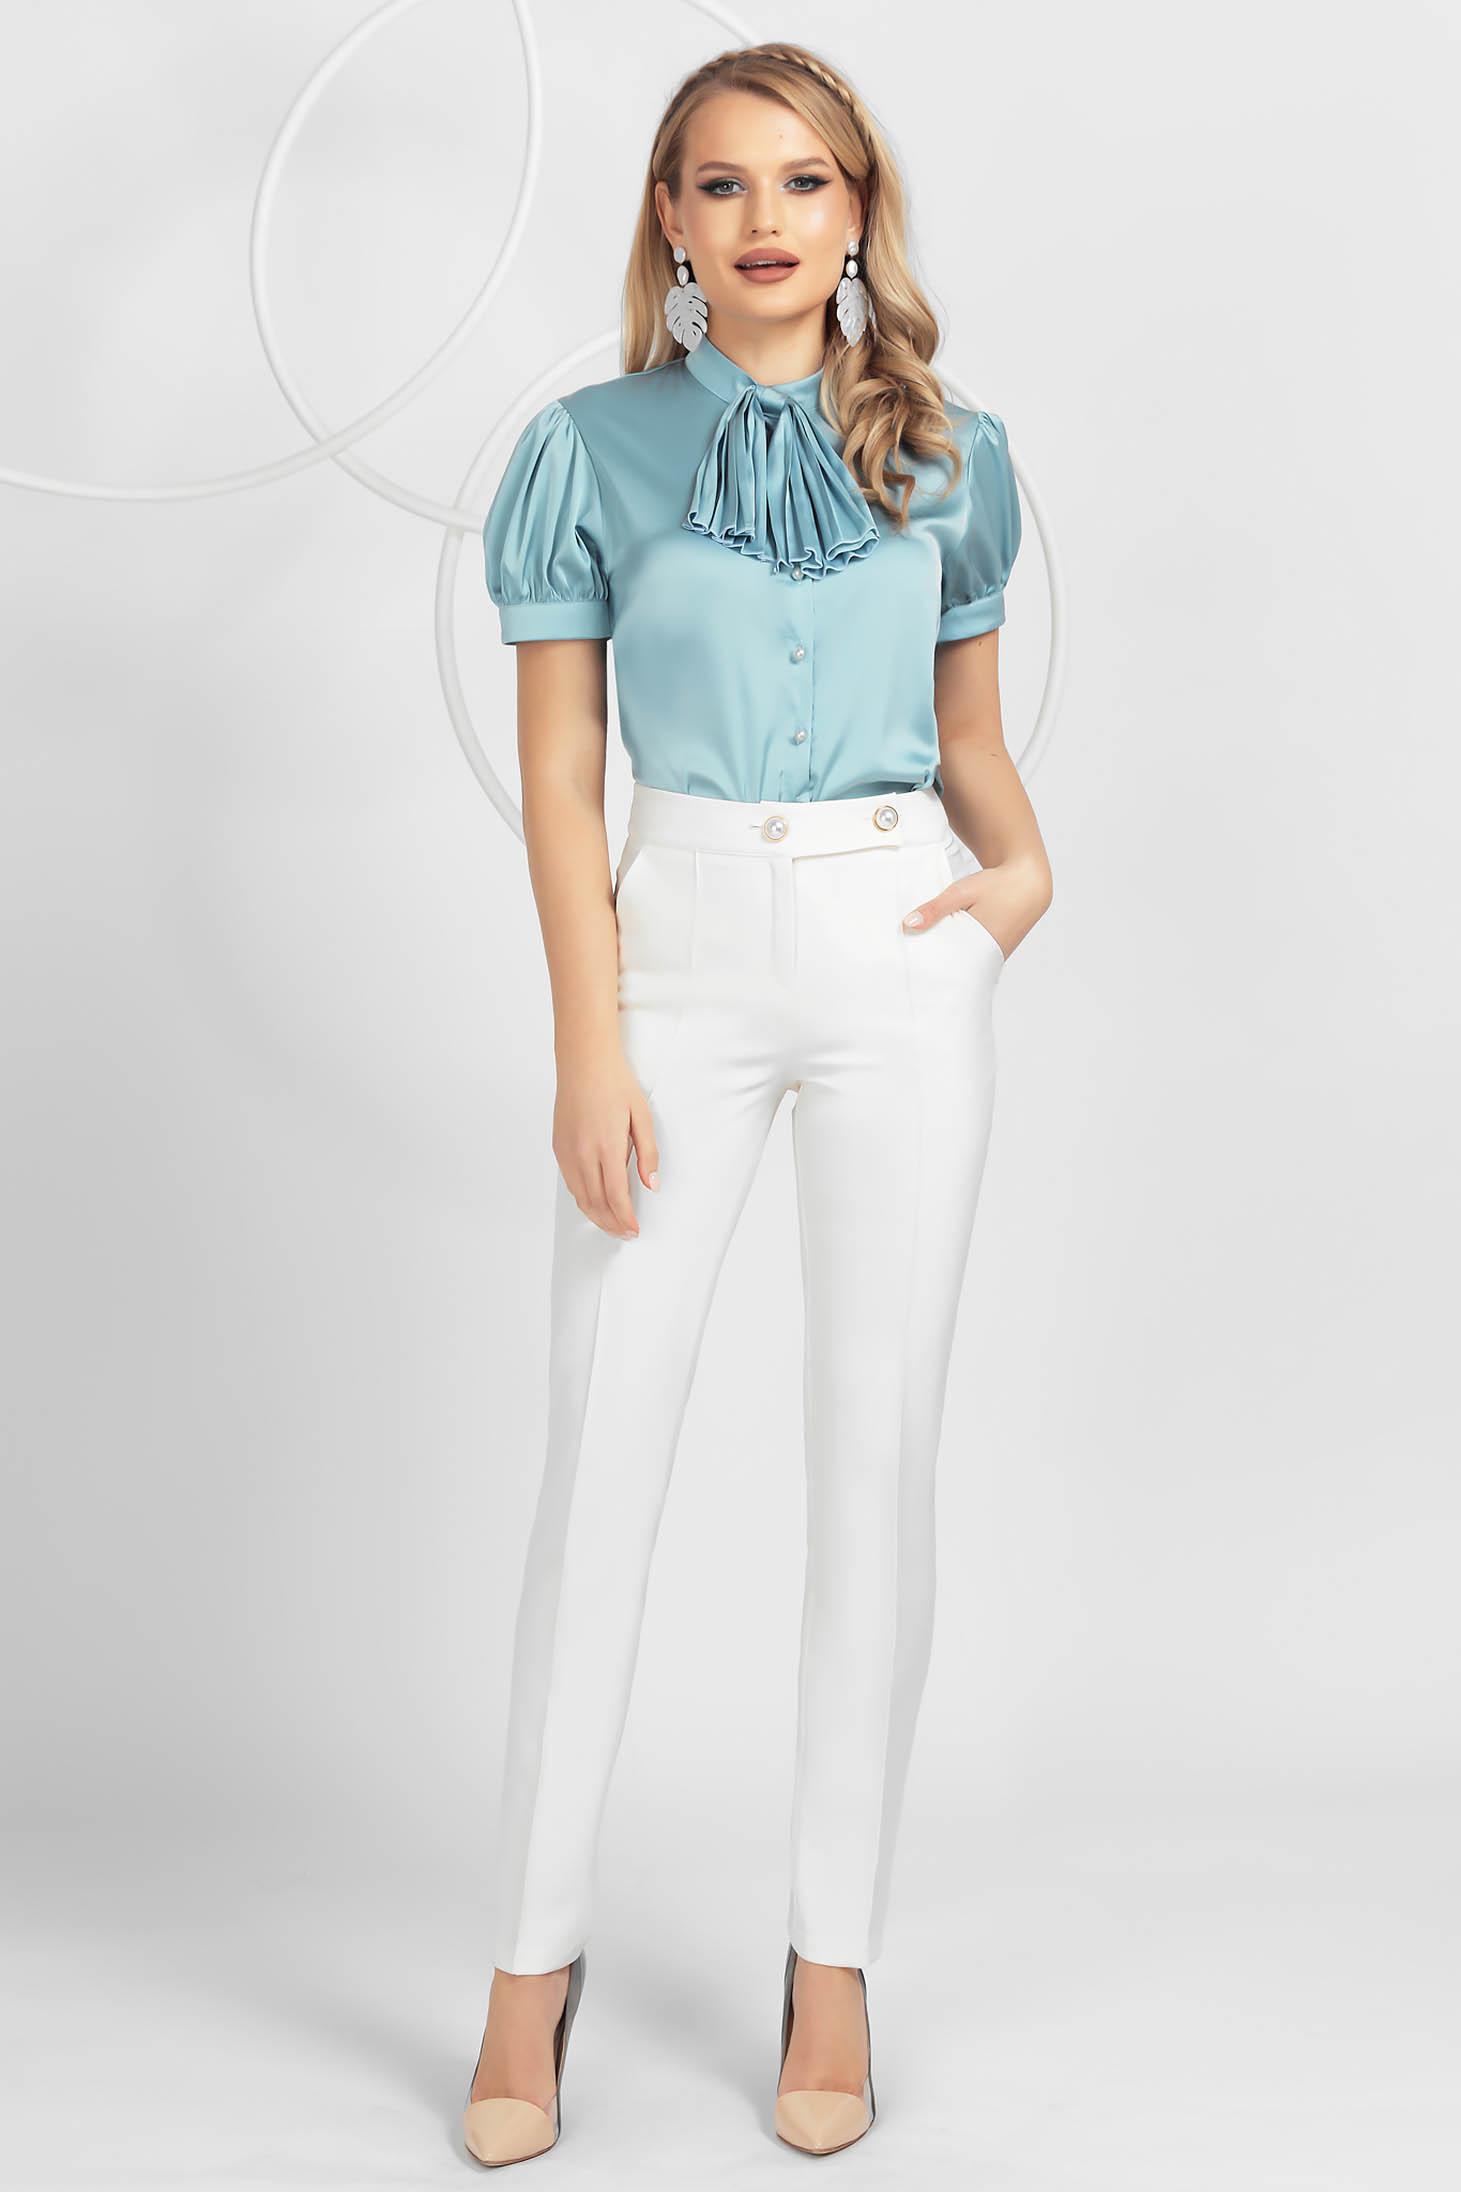 Ivory trousers conical medium waist slightly elastic fabric